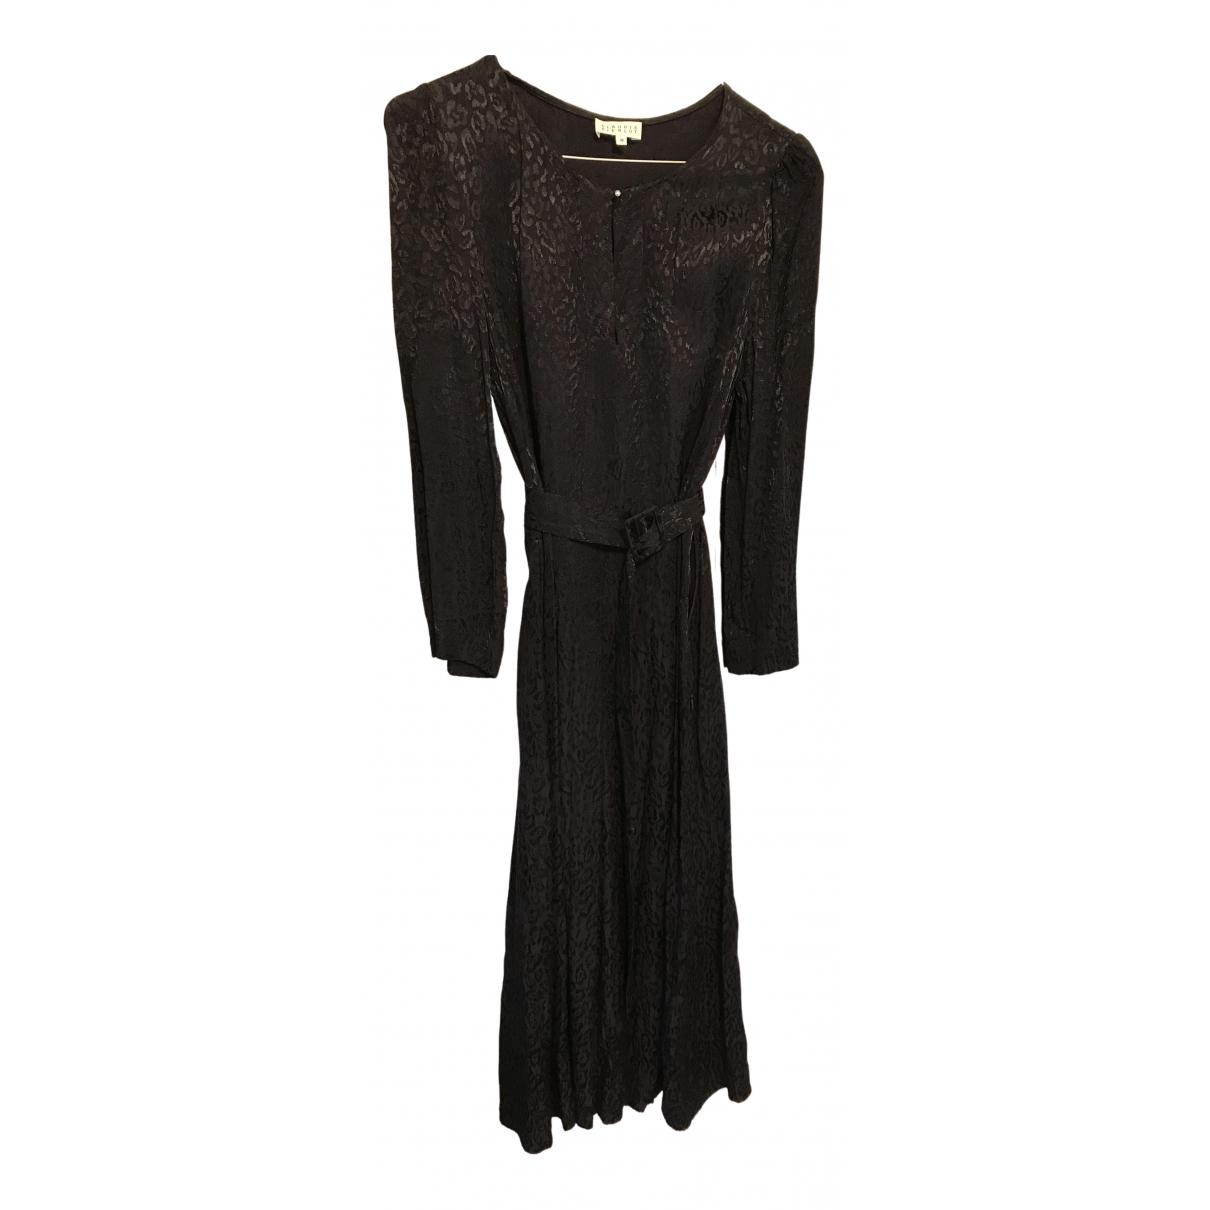 Claudie Pierlot N Navy dress for Women 38 FR